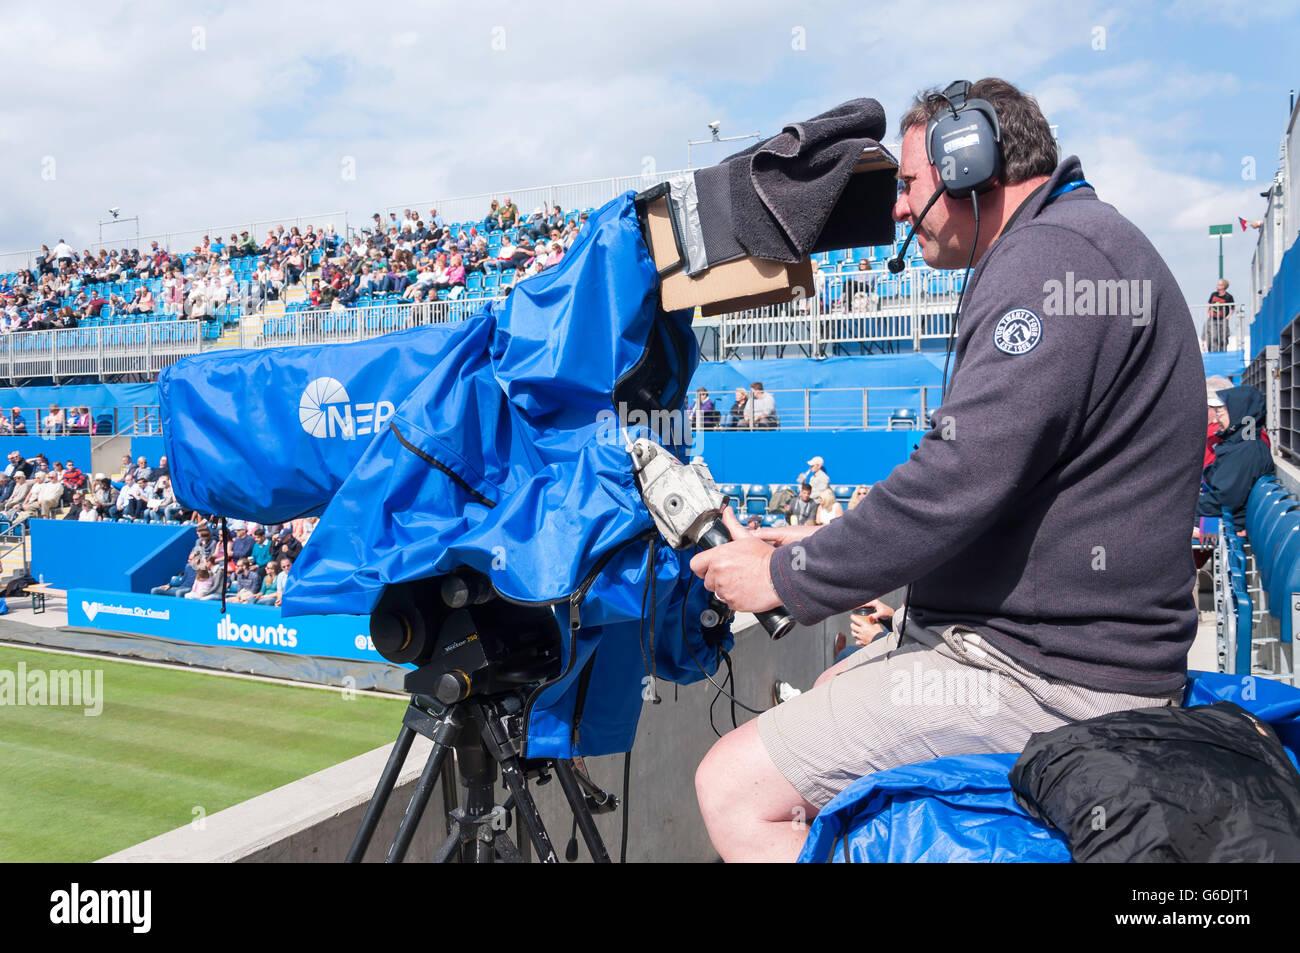 Television cameraman at The Aegon Classic Birmingham, Edgbaston, Birmingham, West Midlands, England, United Kingdom - Stock Image